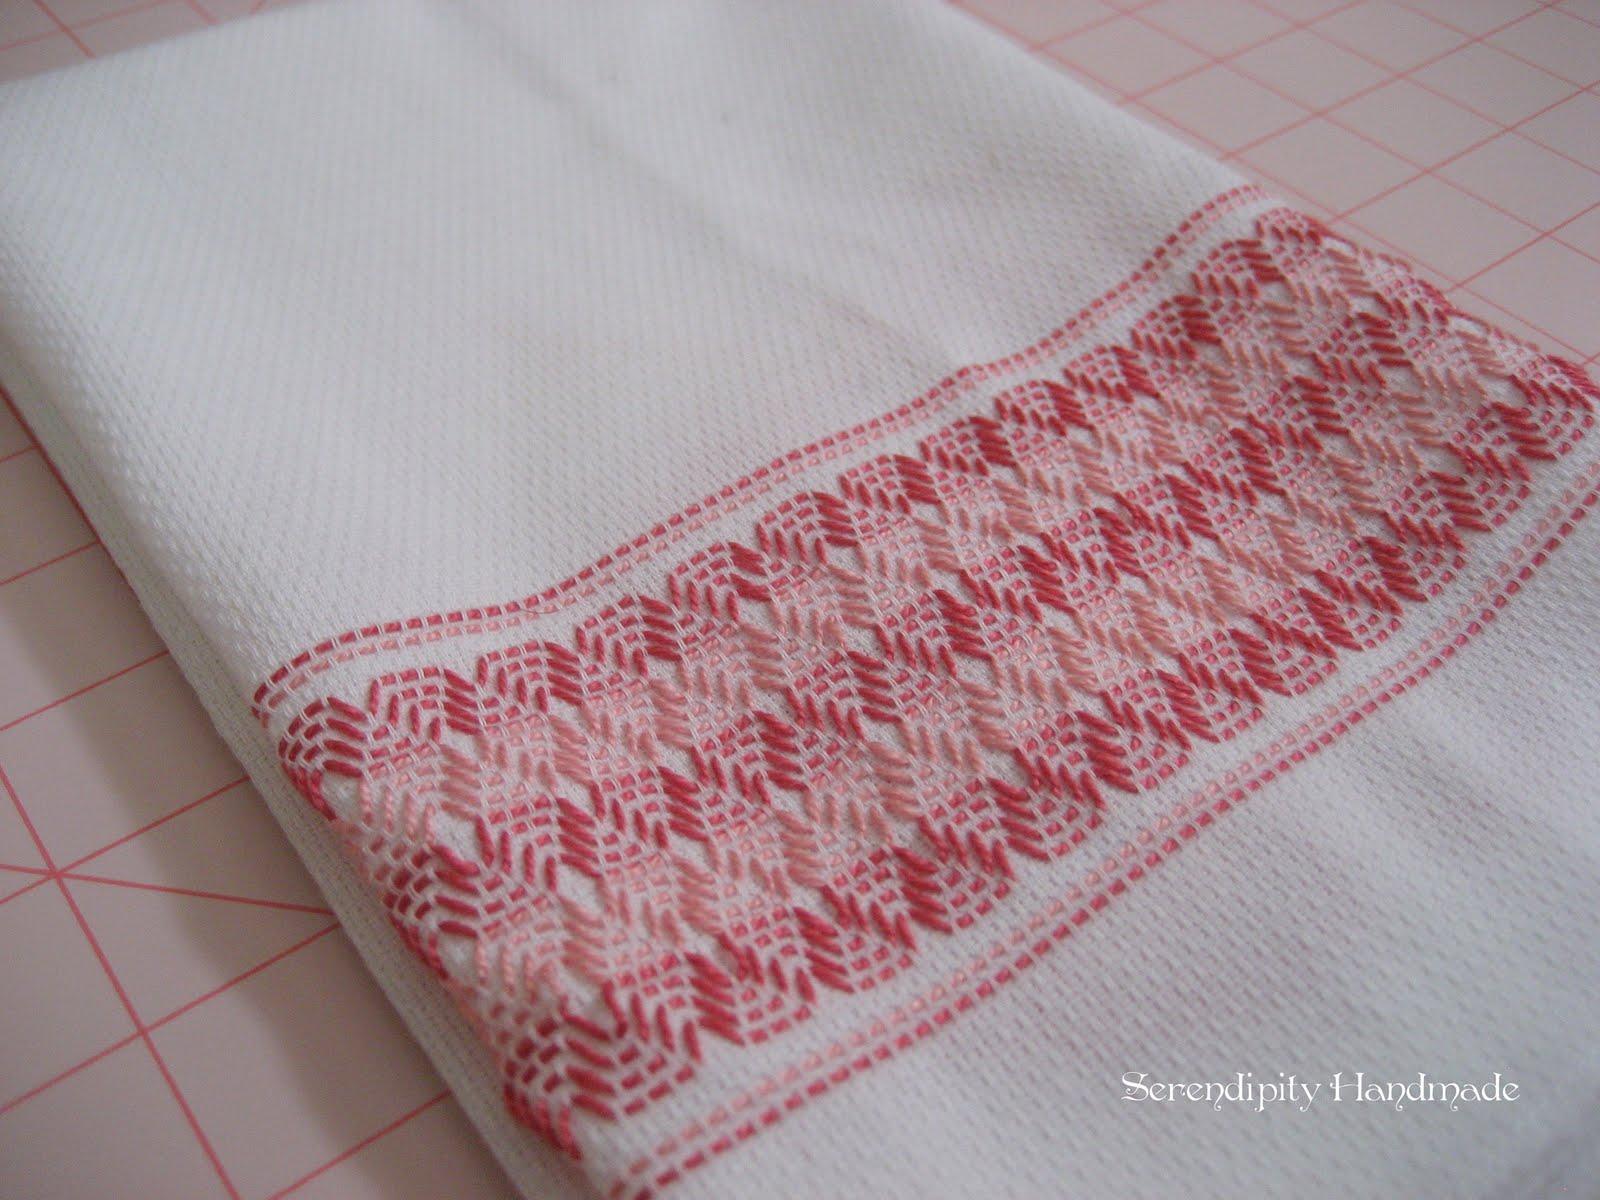 Serendipity Handmade Swedish Weaving Huck Embroidery Tutorial